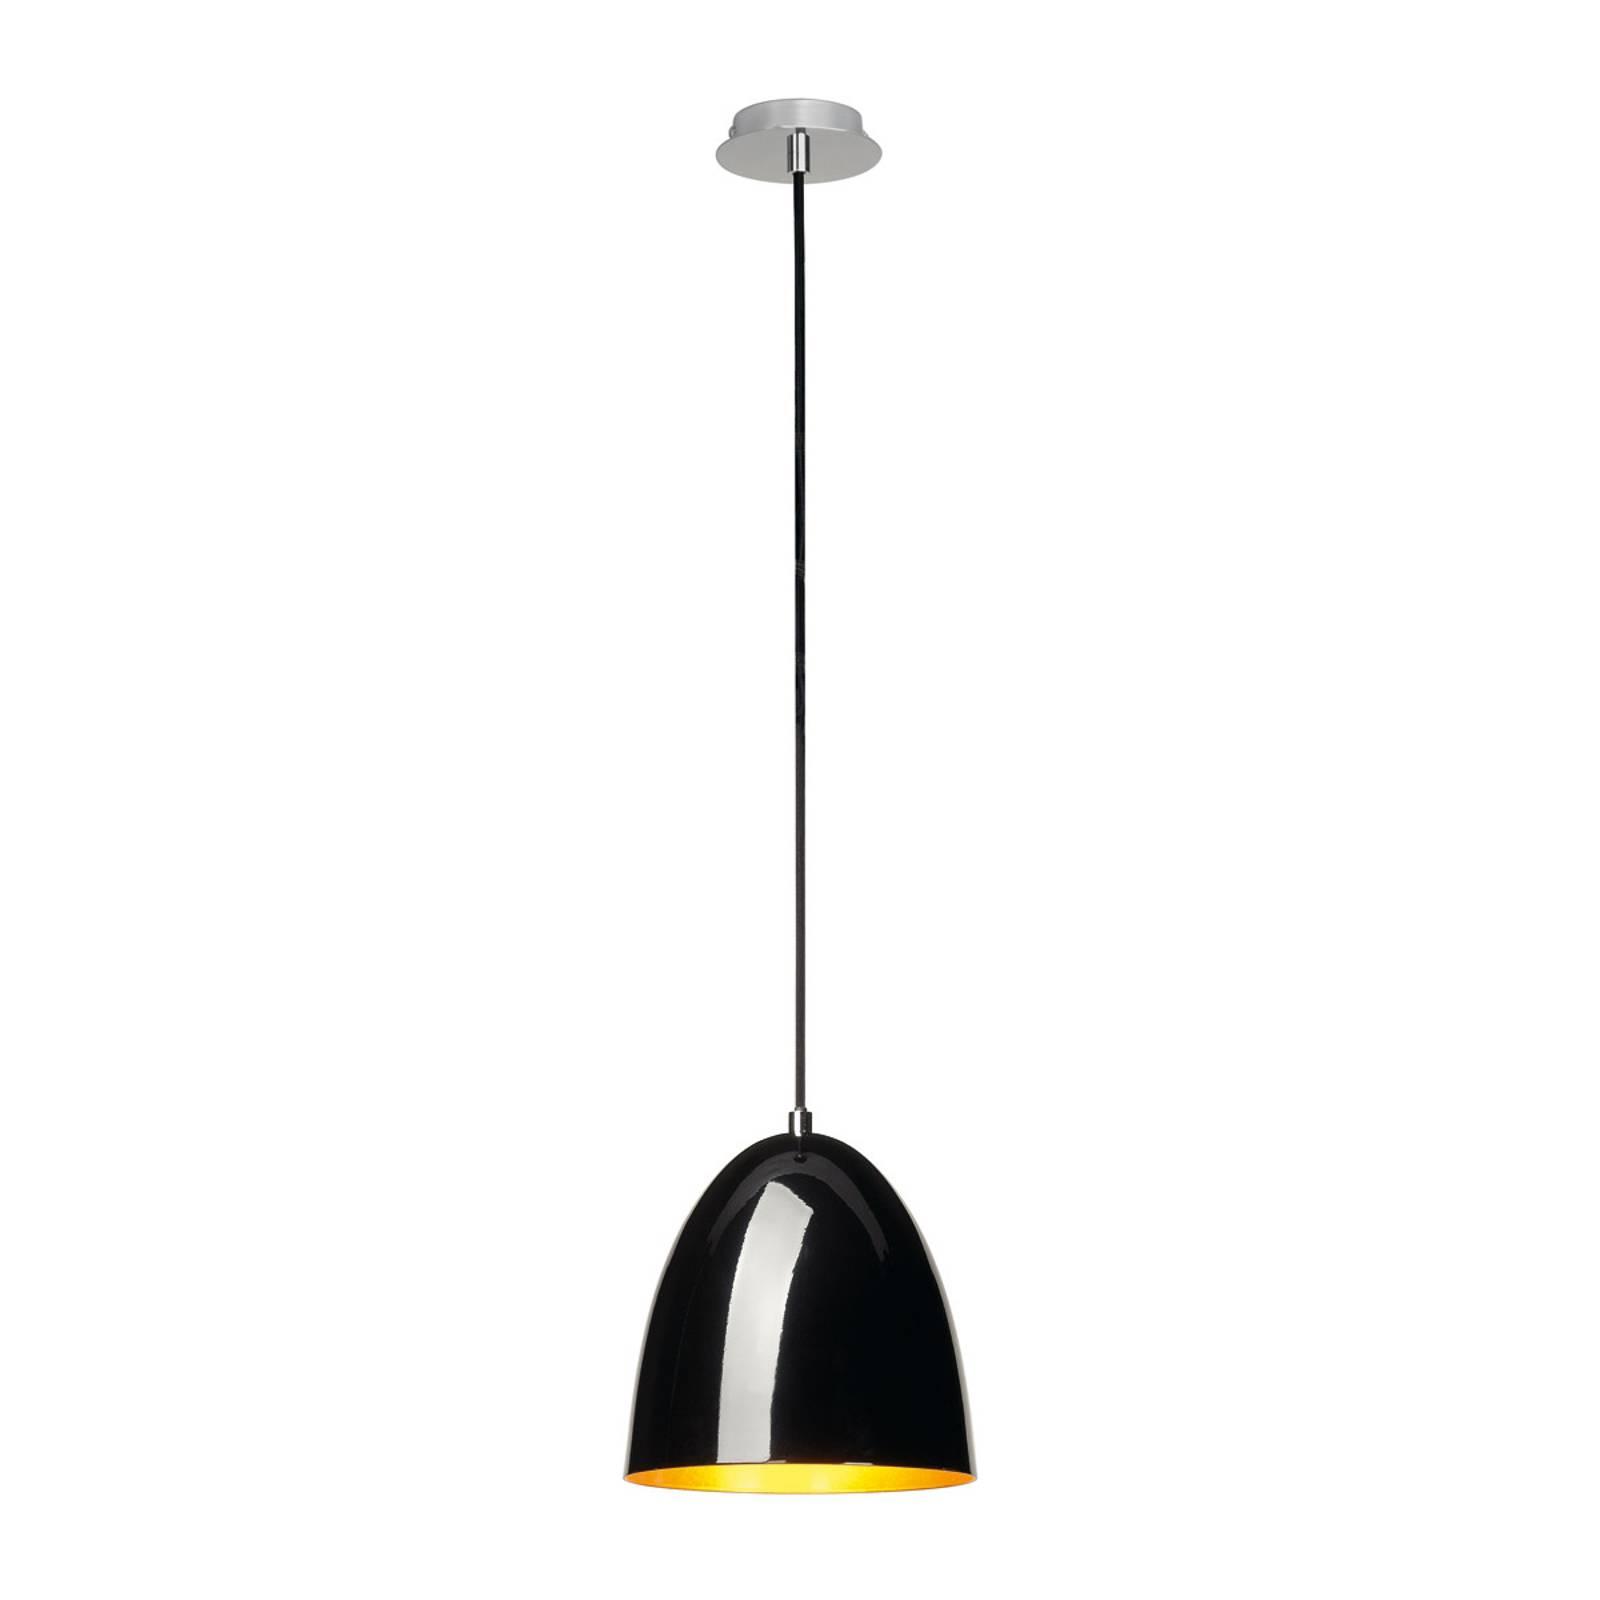 SLV Para Cone 20 hanglamp zwart/goud